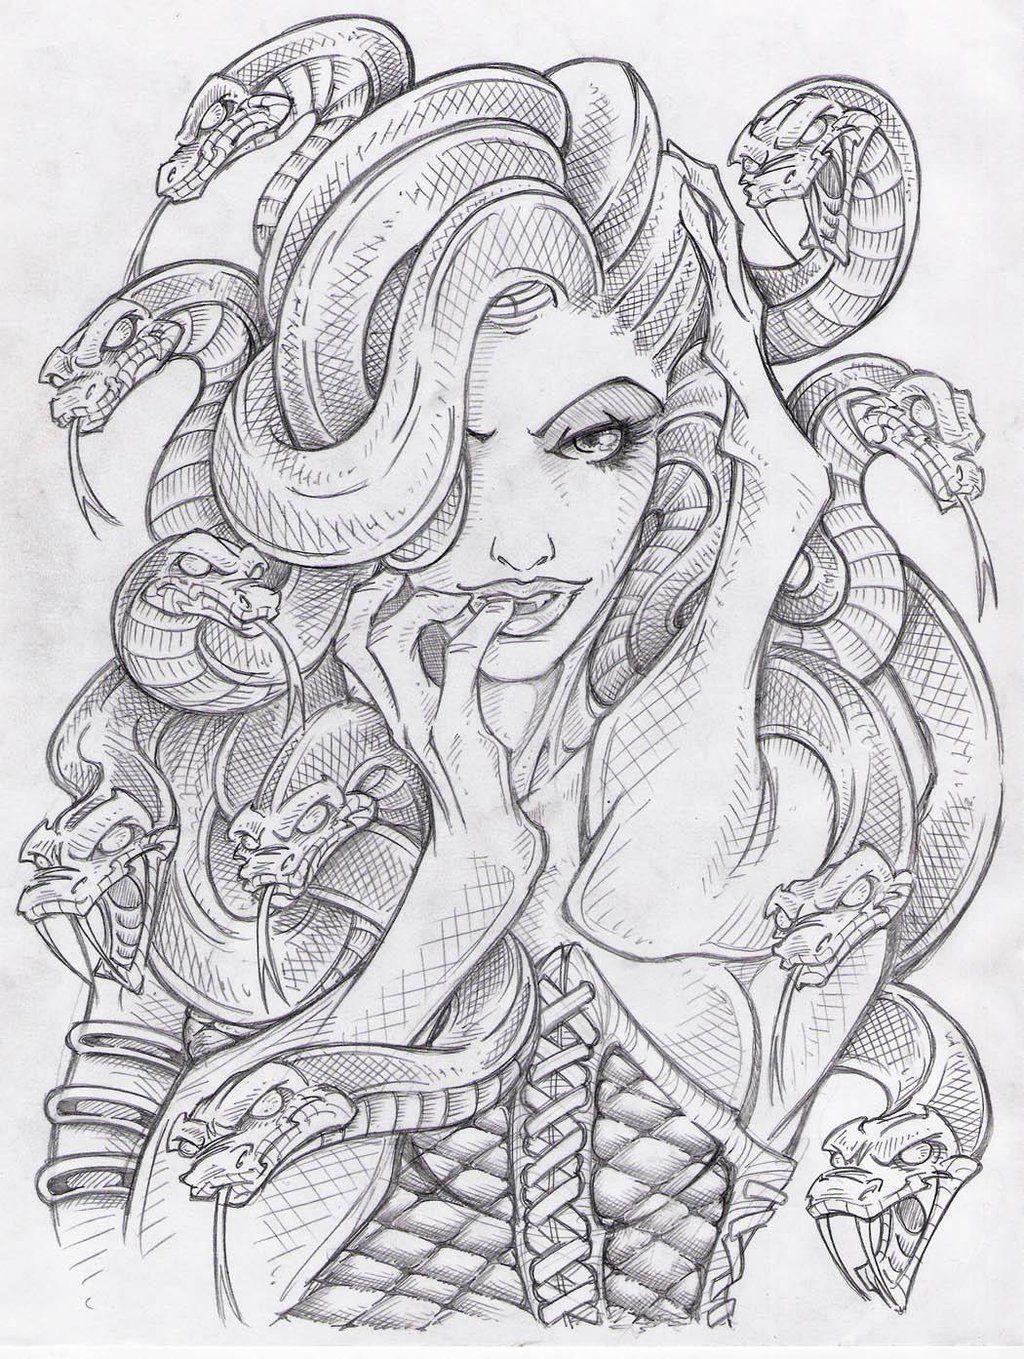 Resultado De Imagen Para Medusa Mitologia Tatuaje Significado Arte De Medusas Cómo Dibujar Cosas Arte Del Bosquejo